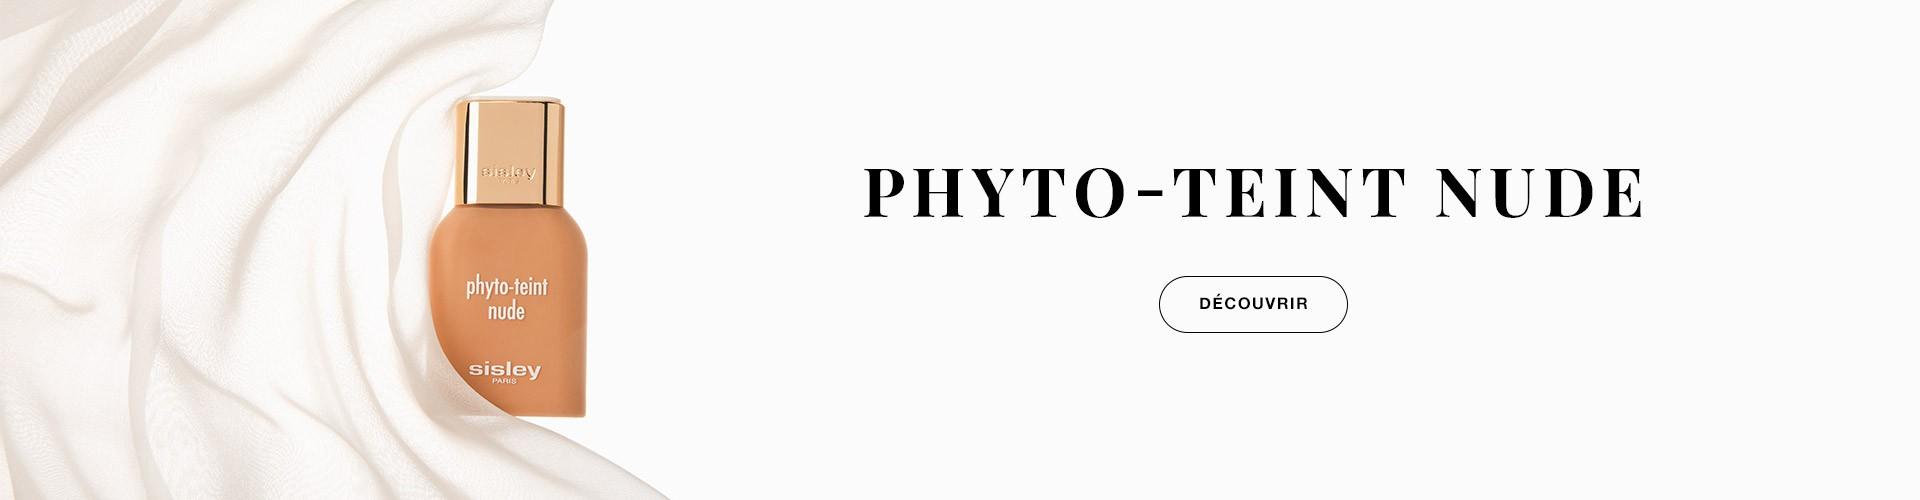 Phyto-Teint Nude